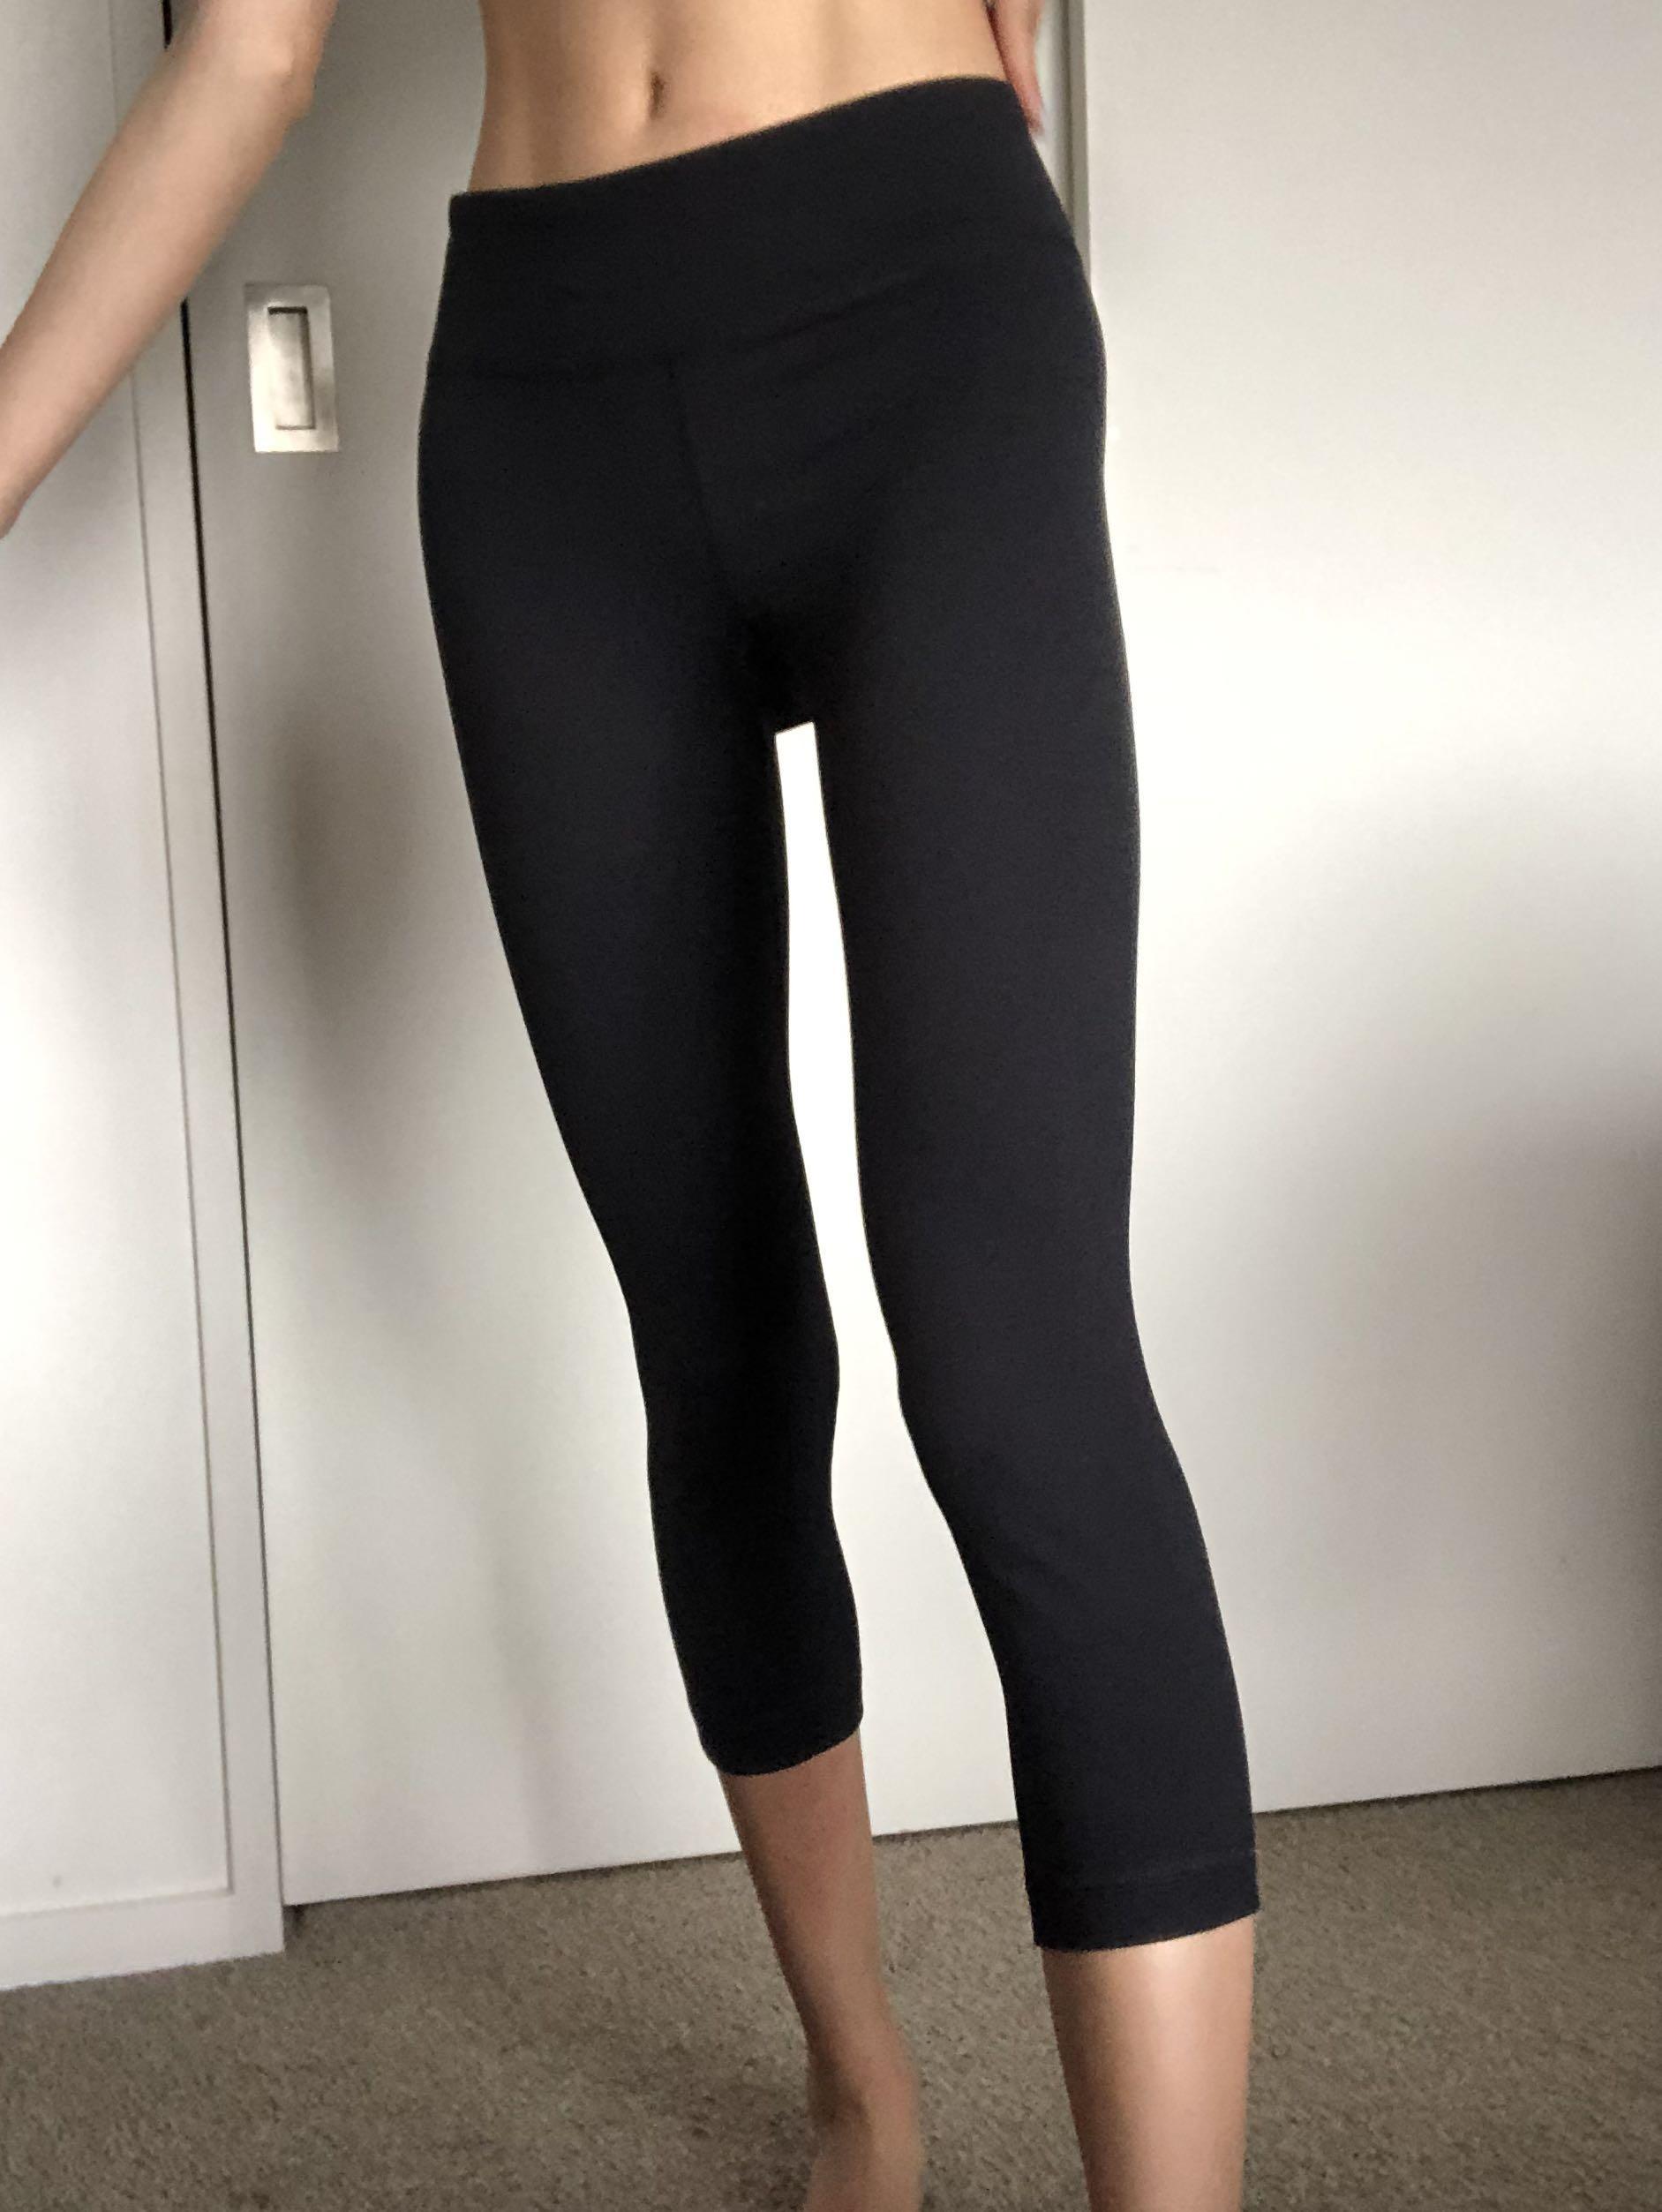 BRAND NEW W/ TAGS: Underarmour leggings ❤️